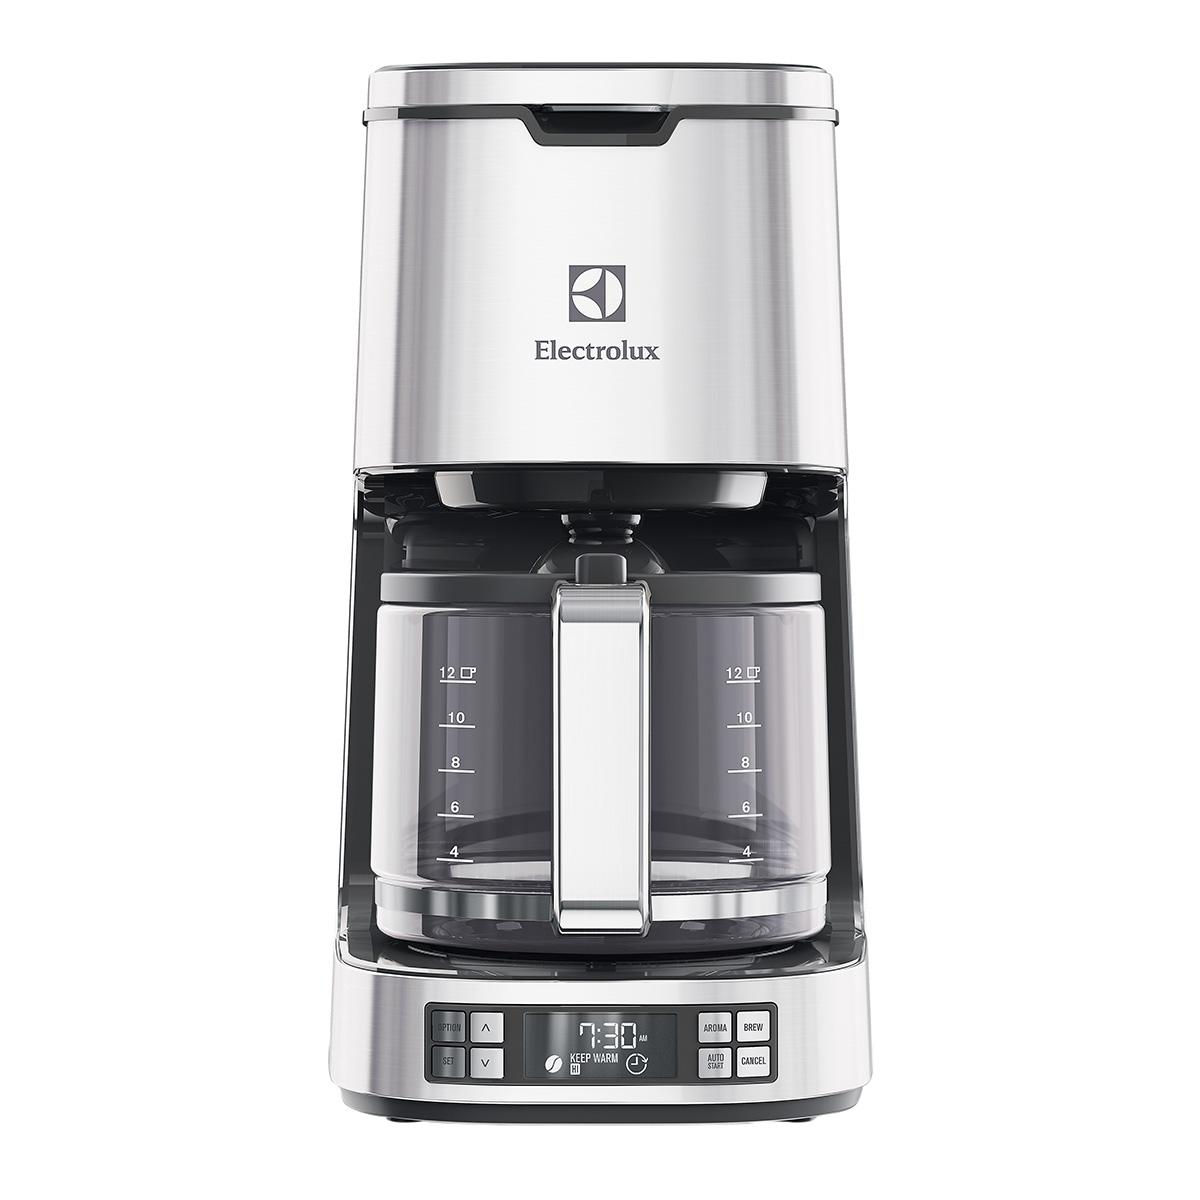 Image of   Electrolux kaffemaskine - EKF7800 - Rustfrit stål